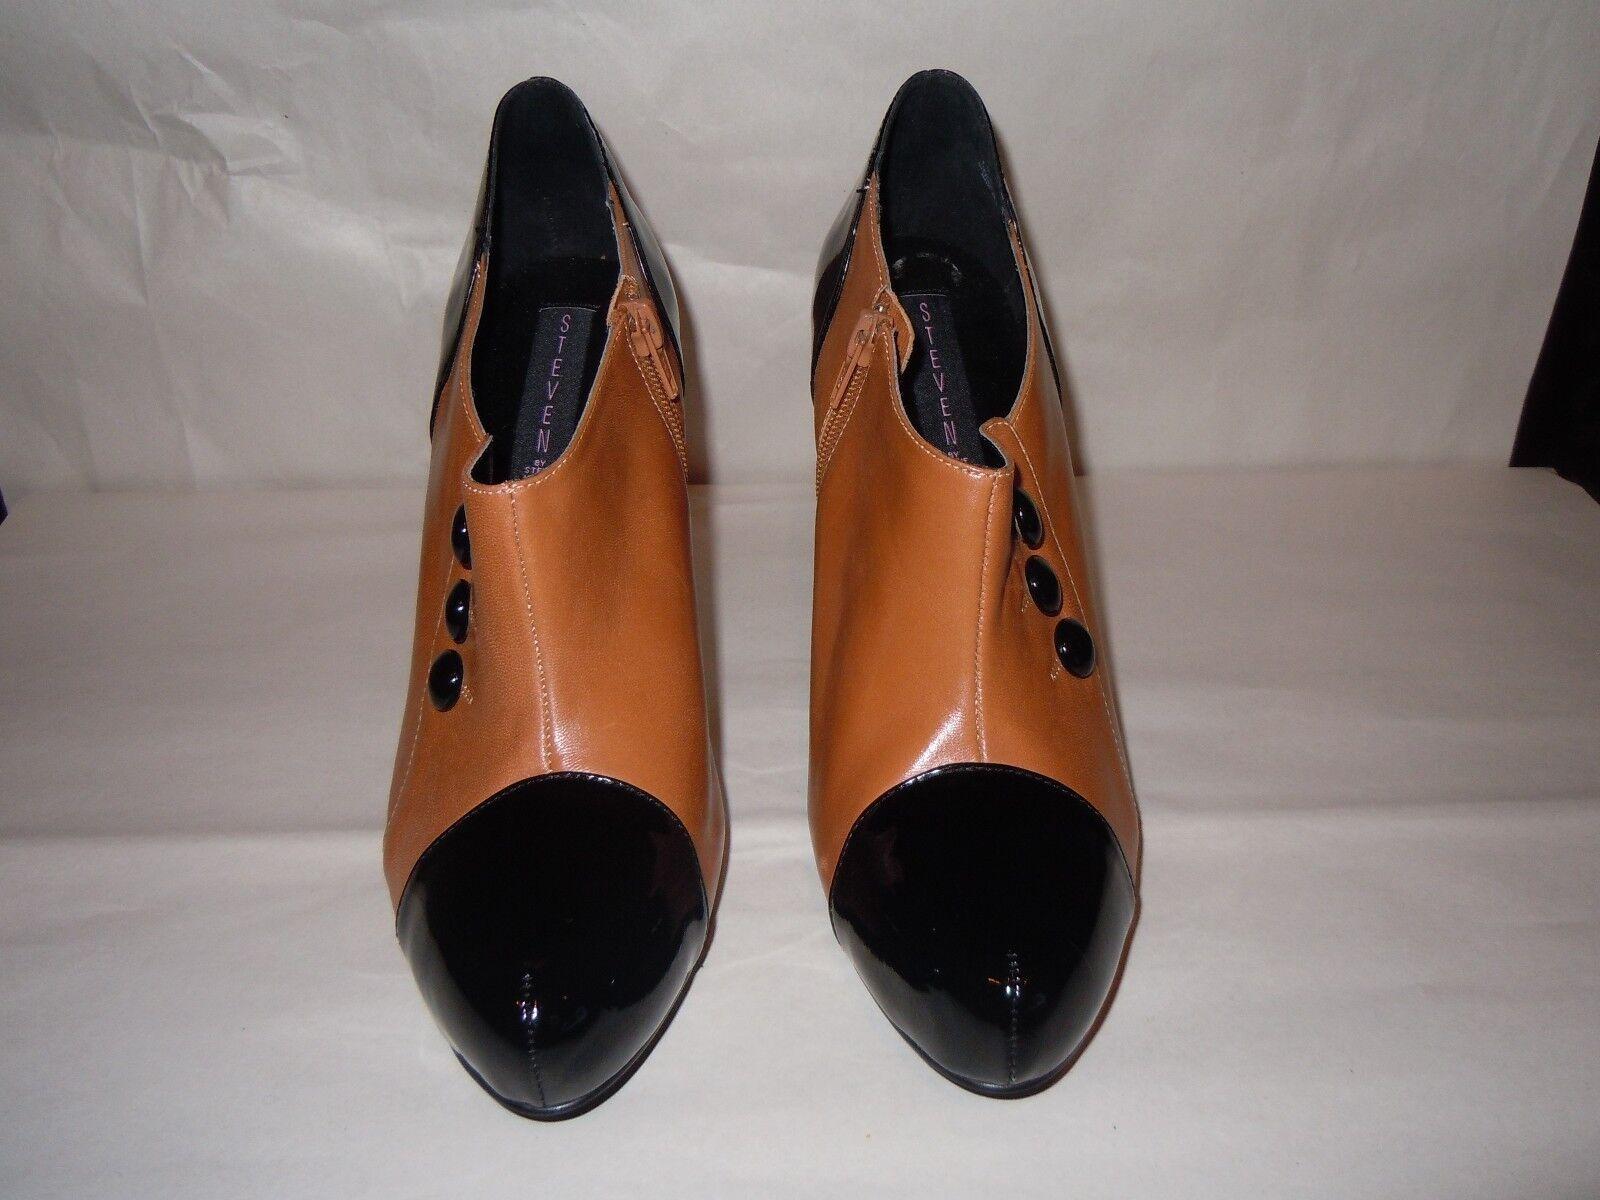 Steve Madden High Heel Booties  Tan Black Leather  Size 9.5